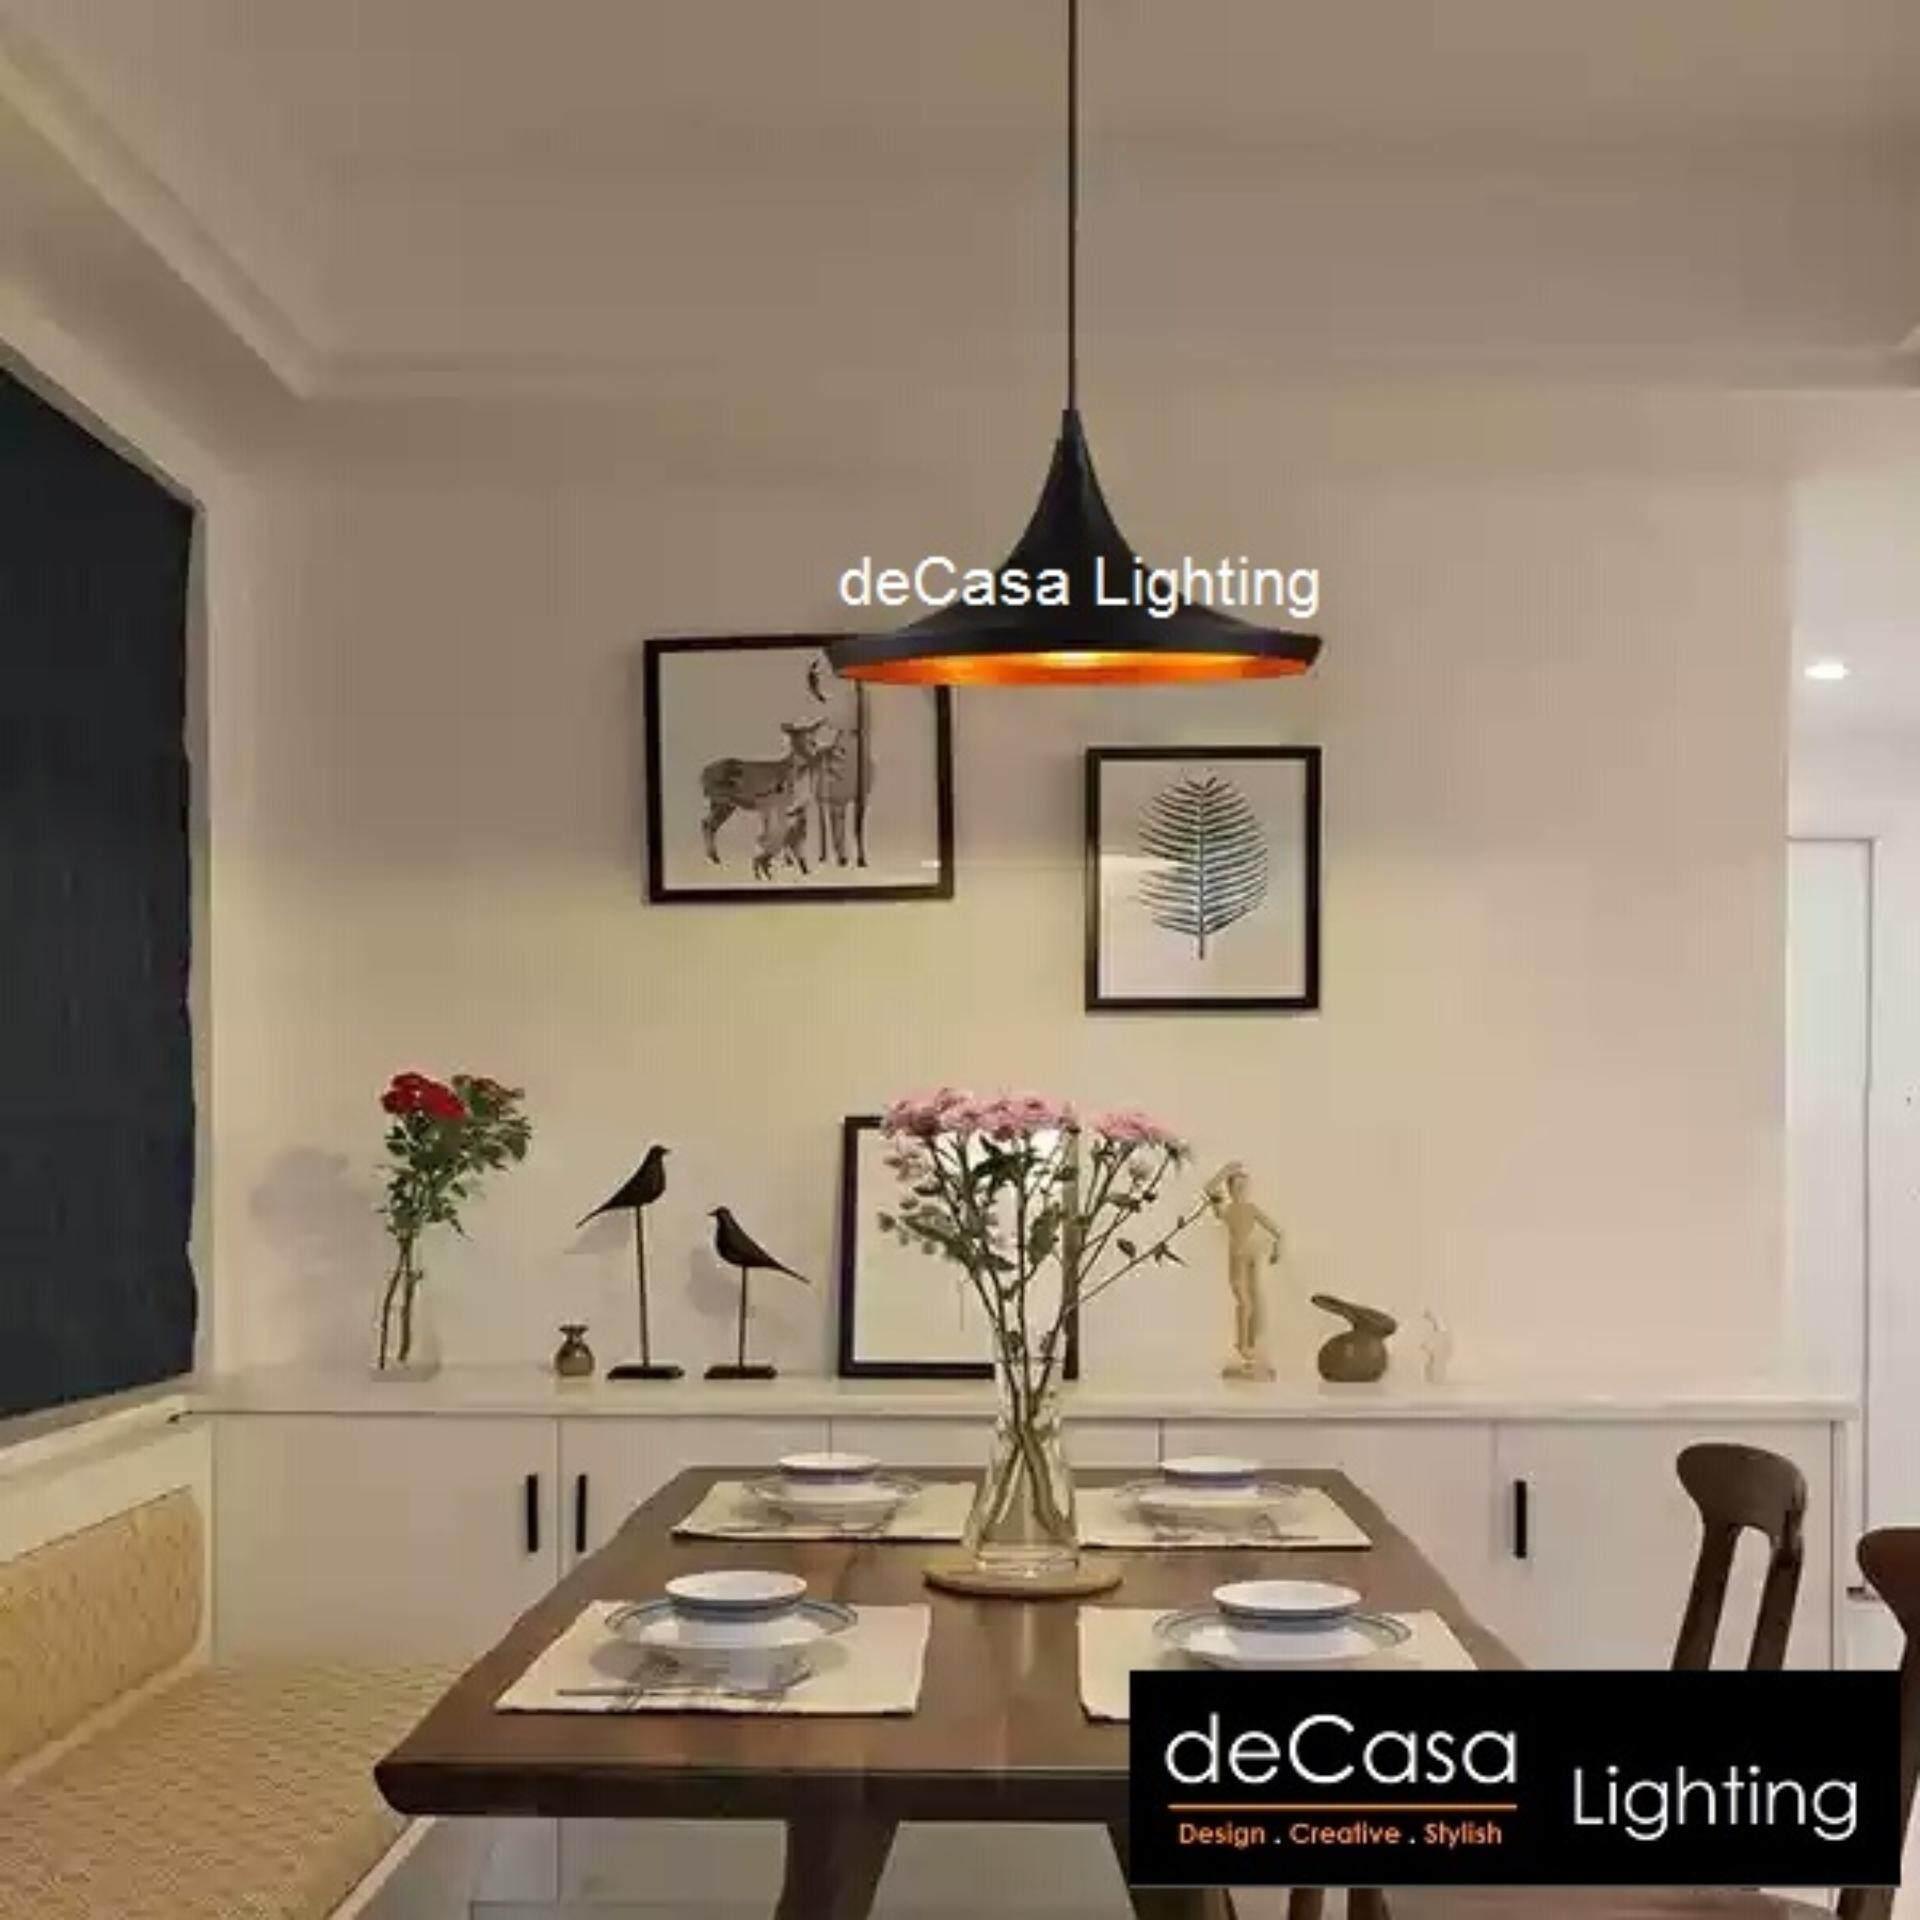 DECASA Modern Designer Decorative Tom Dixon Ceiling Light Pendant Light (Black) Type A (NSB-ZC1516-BK+GD-A)